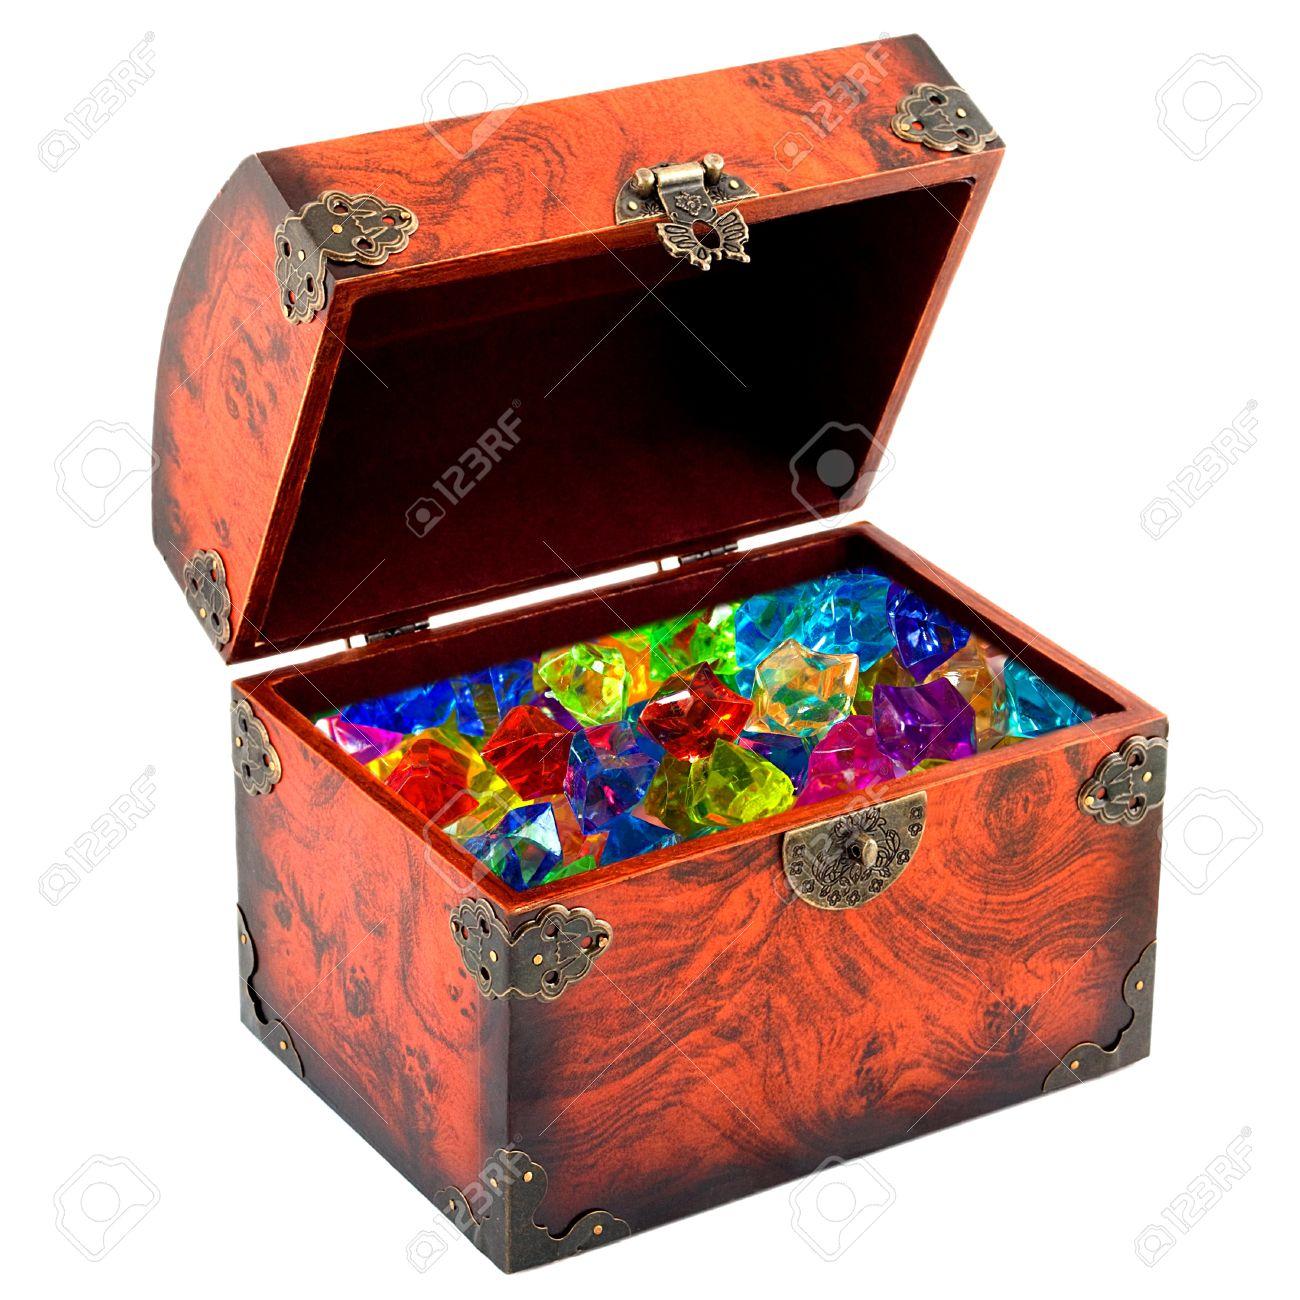 Open treasure chest diamond isolated on white background Stock Photo - 13962833